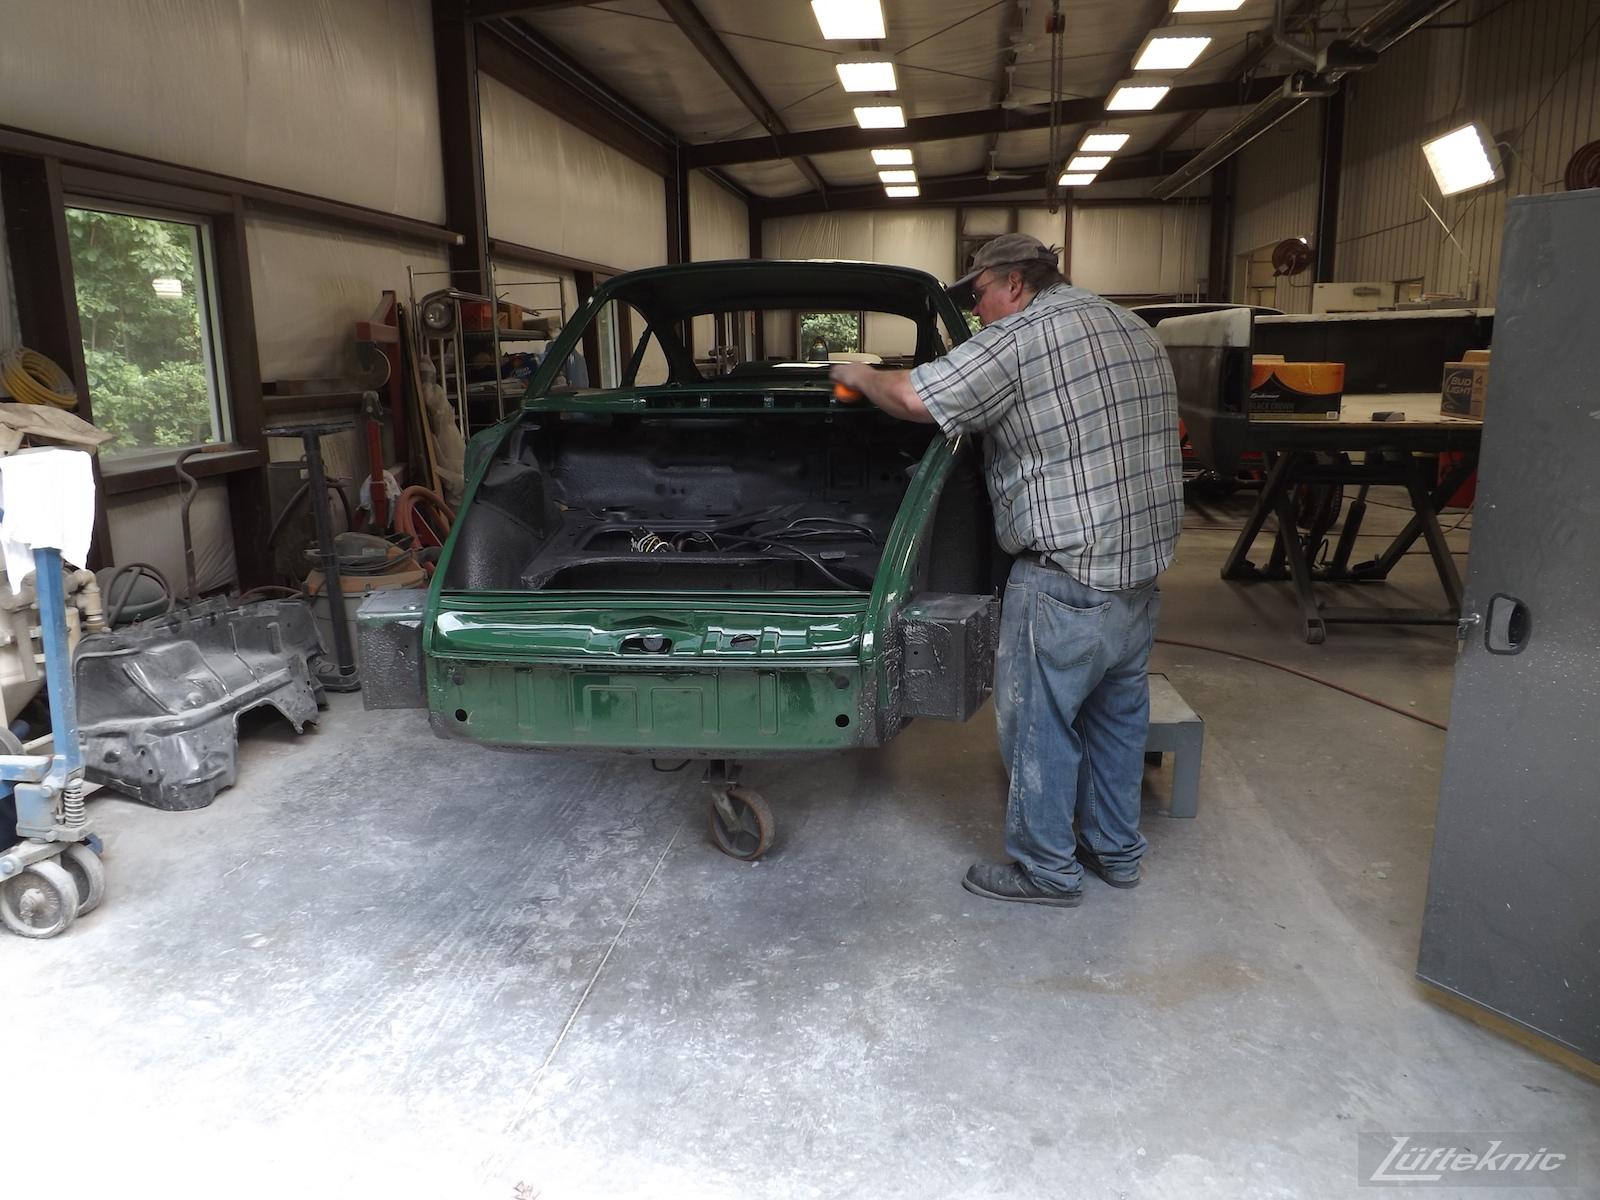 Final touches on the body of an Irish Green Porsche 912 undergoing restoration at Lufteknic.